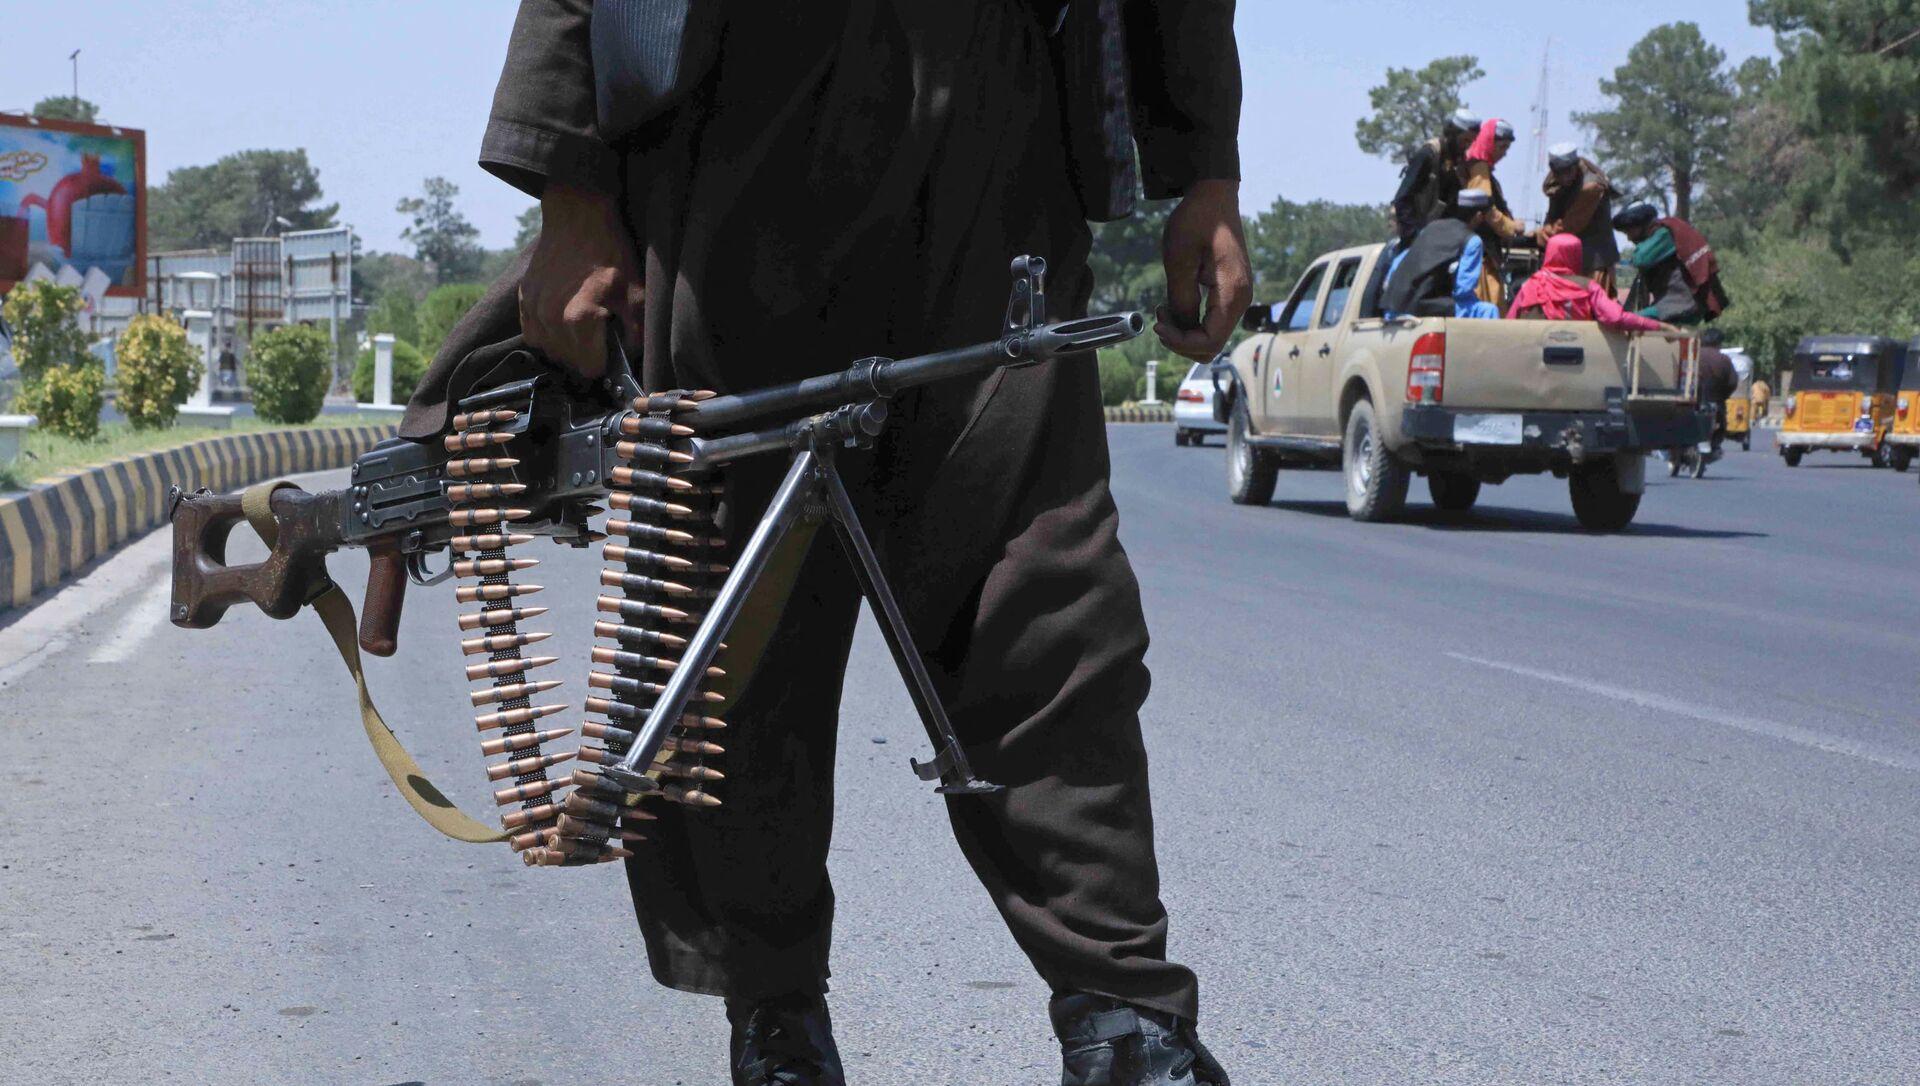 Боец Талибана стоит на страже на улице в Герате 14 августа 2021 г. - Sputnik Абхазия, 1920, 16.08.2021